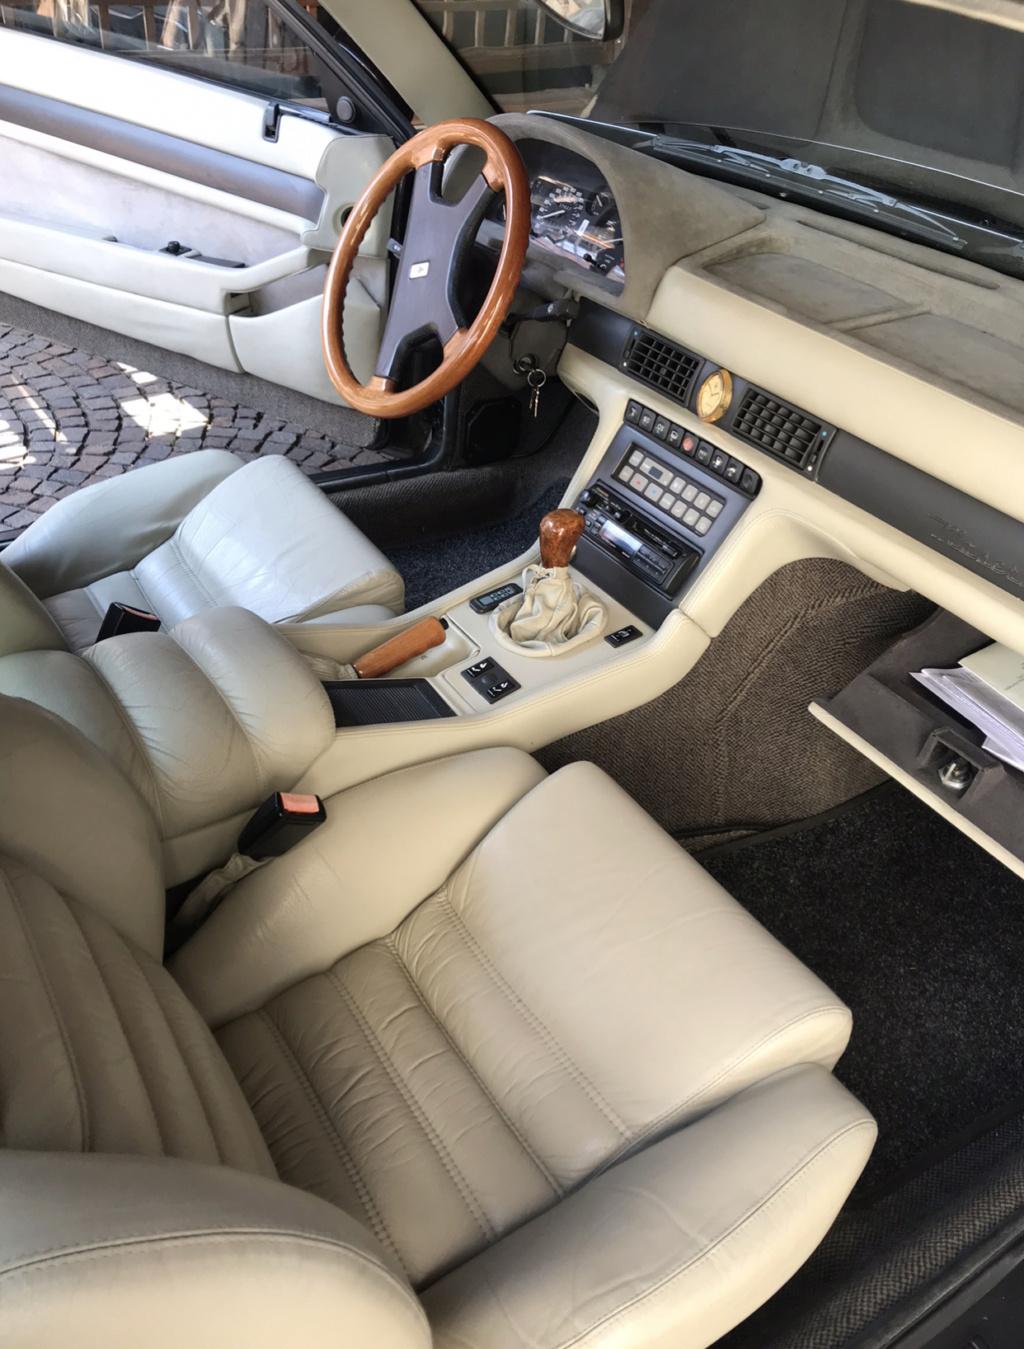 La mia prima Maserati: Racing o 3200GT? - Pagina 2 D362d610